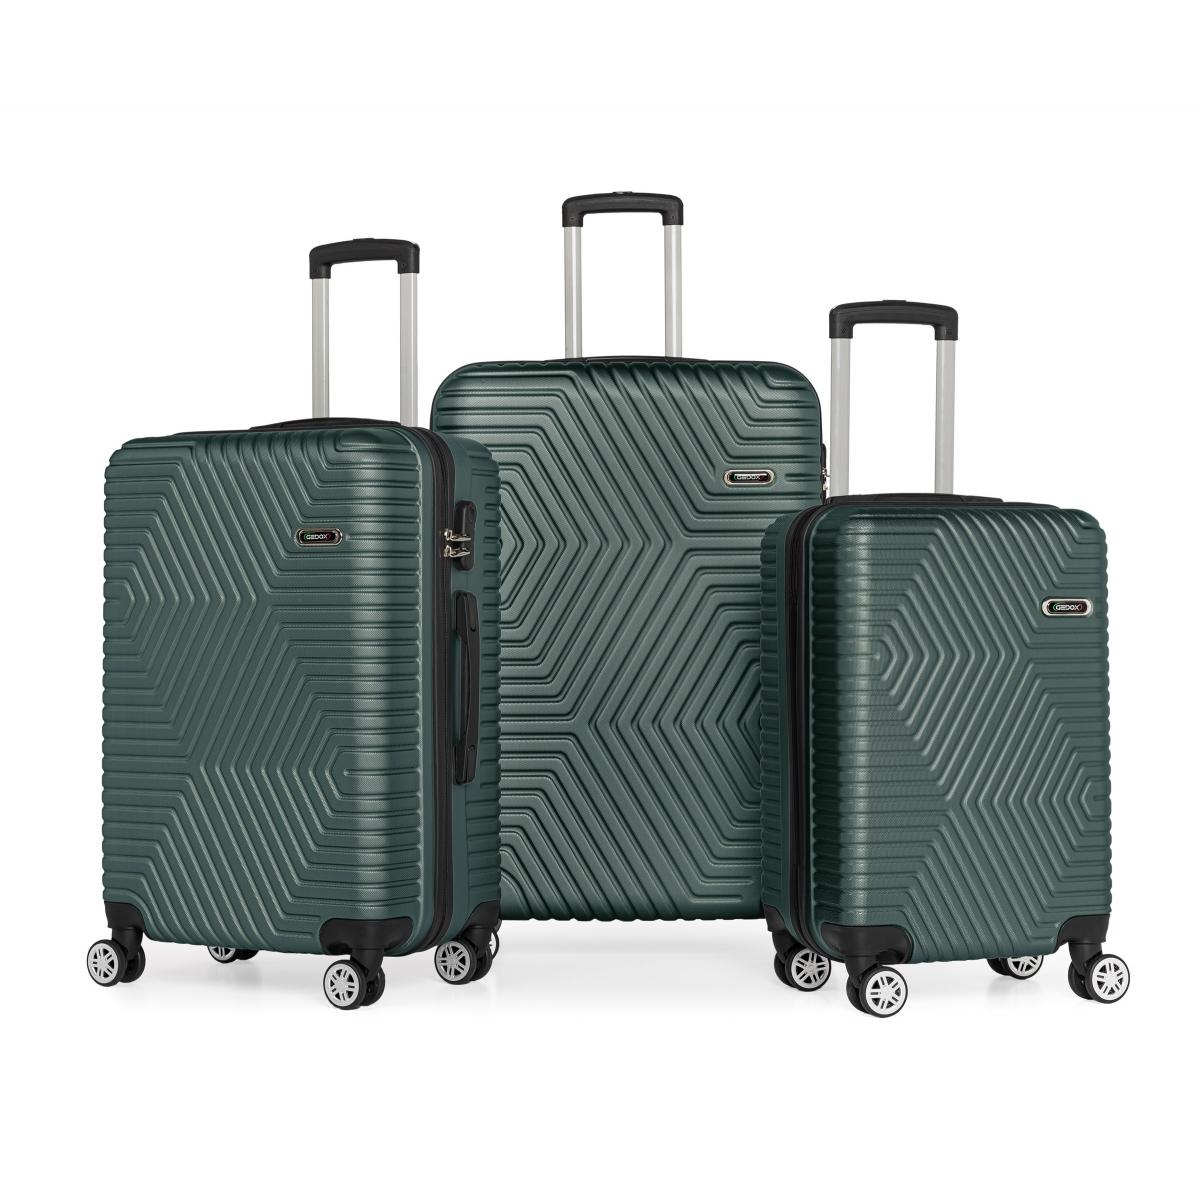 G&D Polo Suitcase ABS 3'lü Lüx Valiz Seyahat Seti - Model:600.07 Haki Yeşil